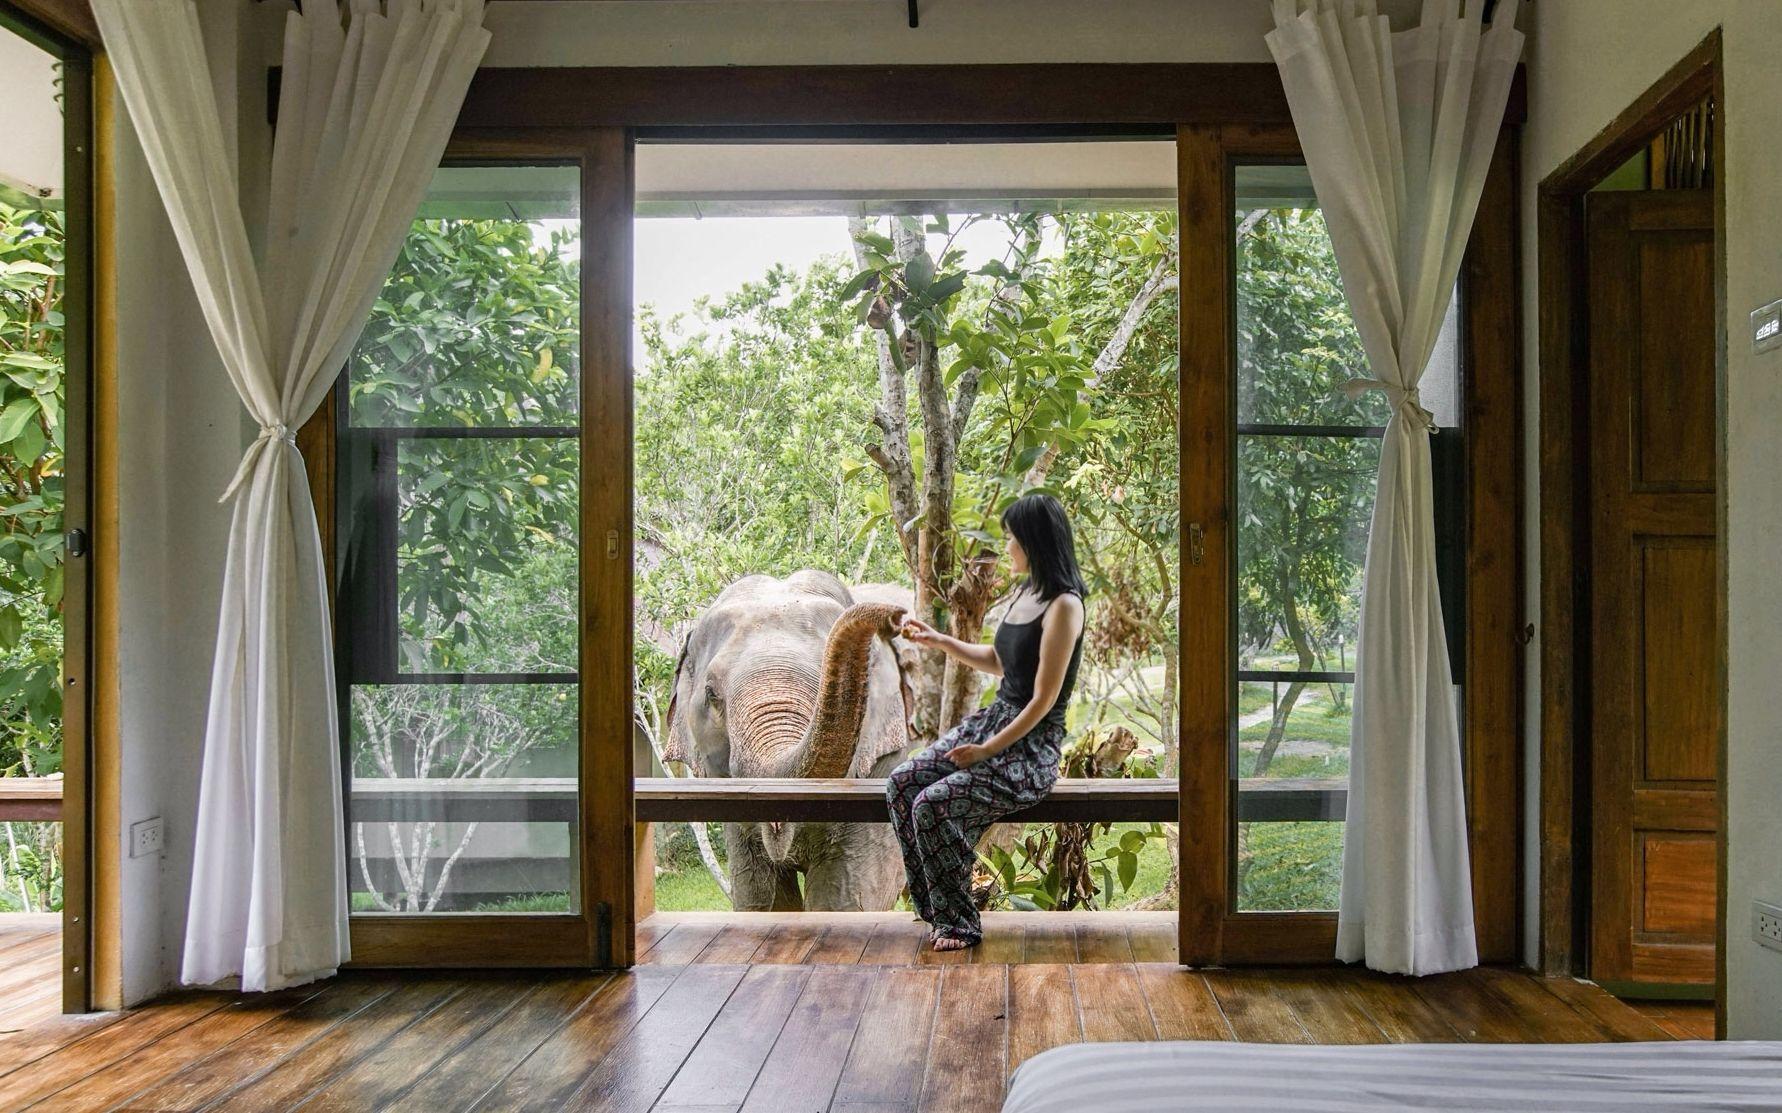 她從紐約搬到泰國叢林6年:原始生活能讓人停止攀比,真正享受人生_嗶哩嗶哩 (゜-゜)つロ 干杯~-bilibili